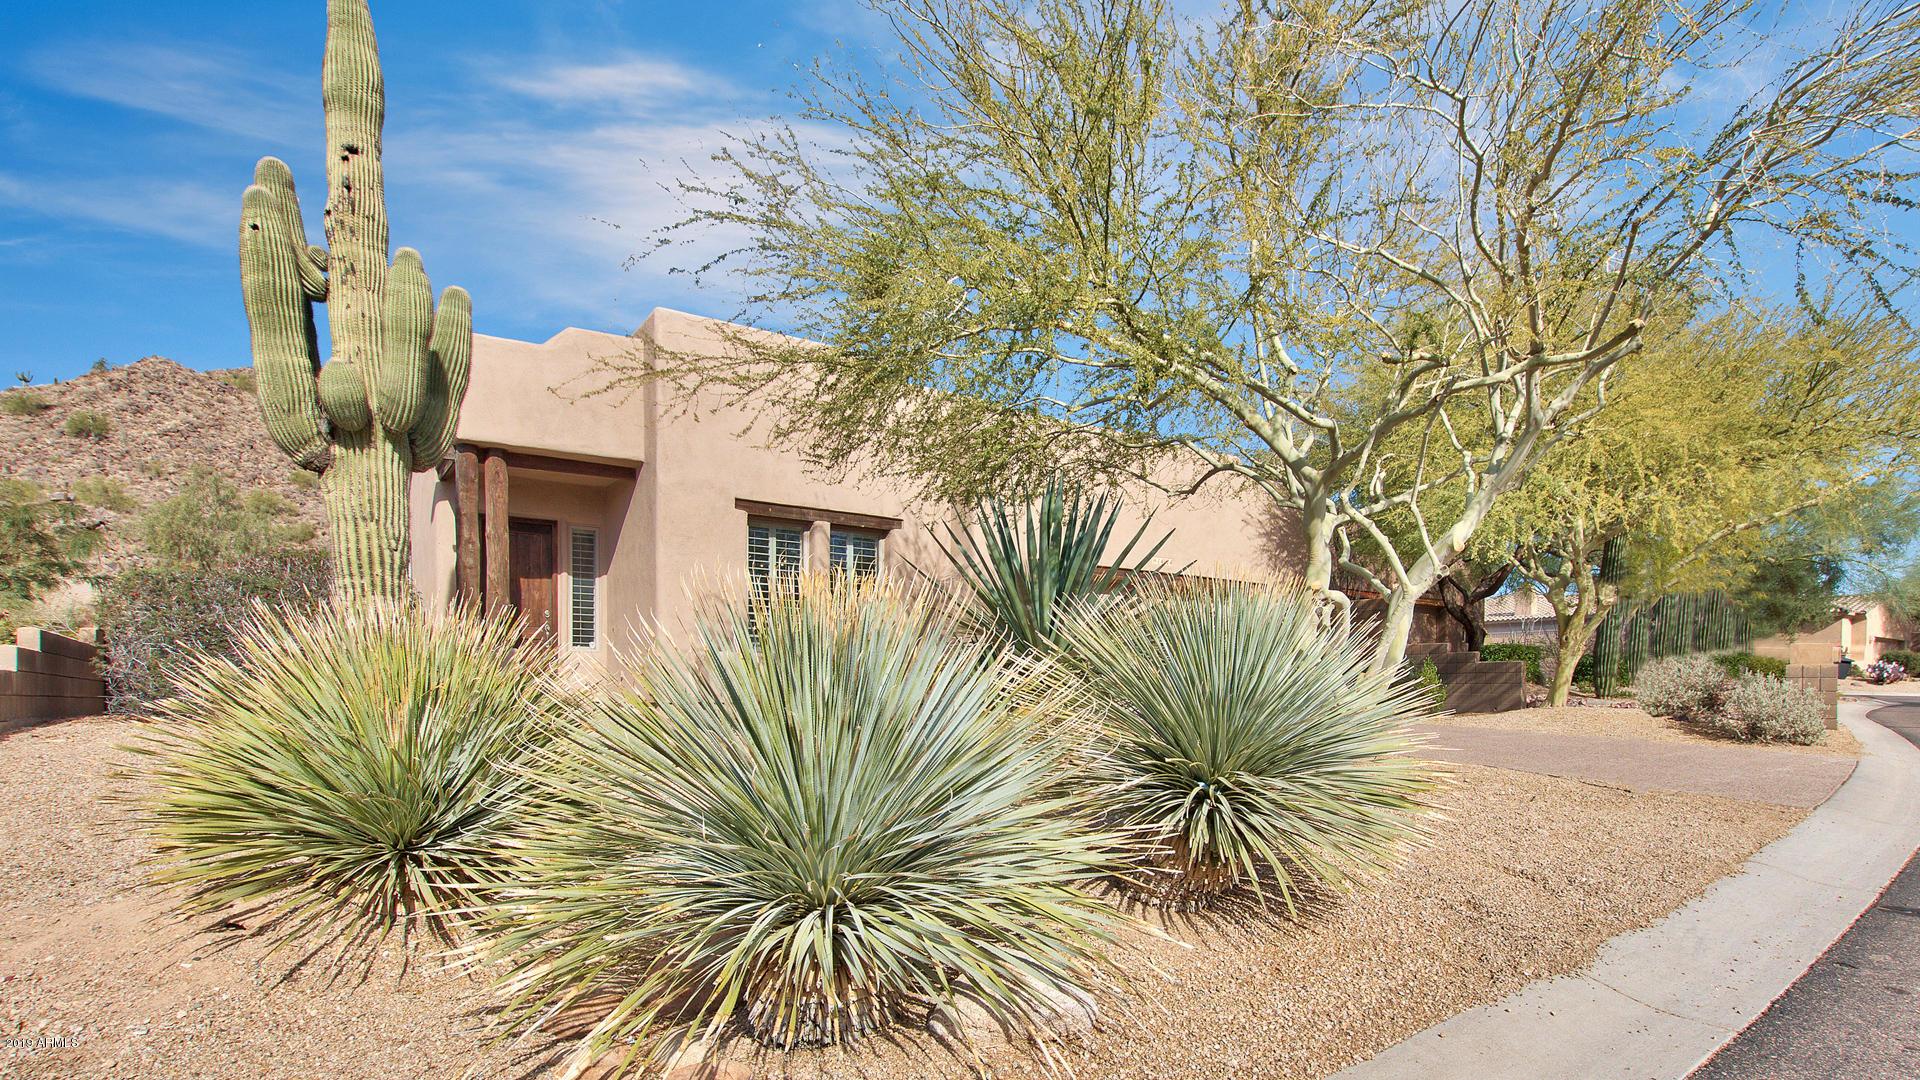 Photo of 14074 E GERONIMO Road, Scottsdale, AZ 85259